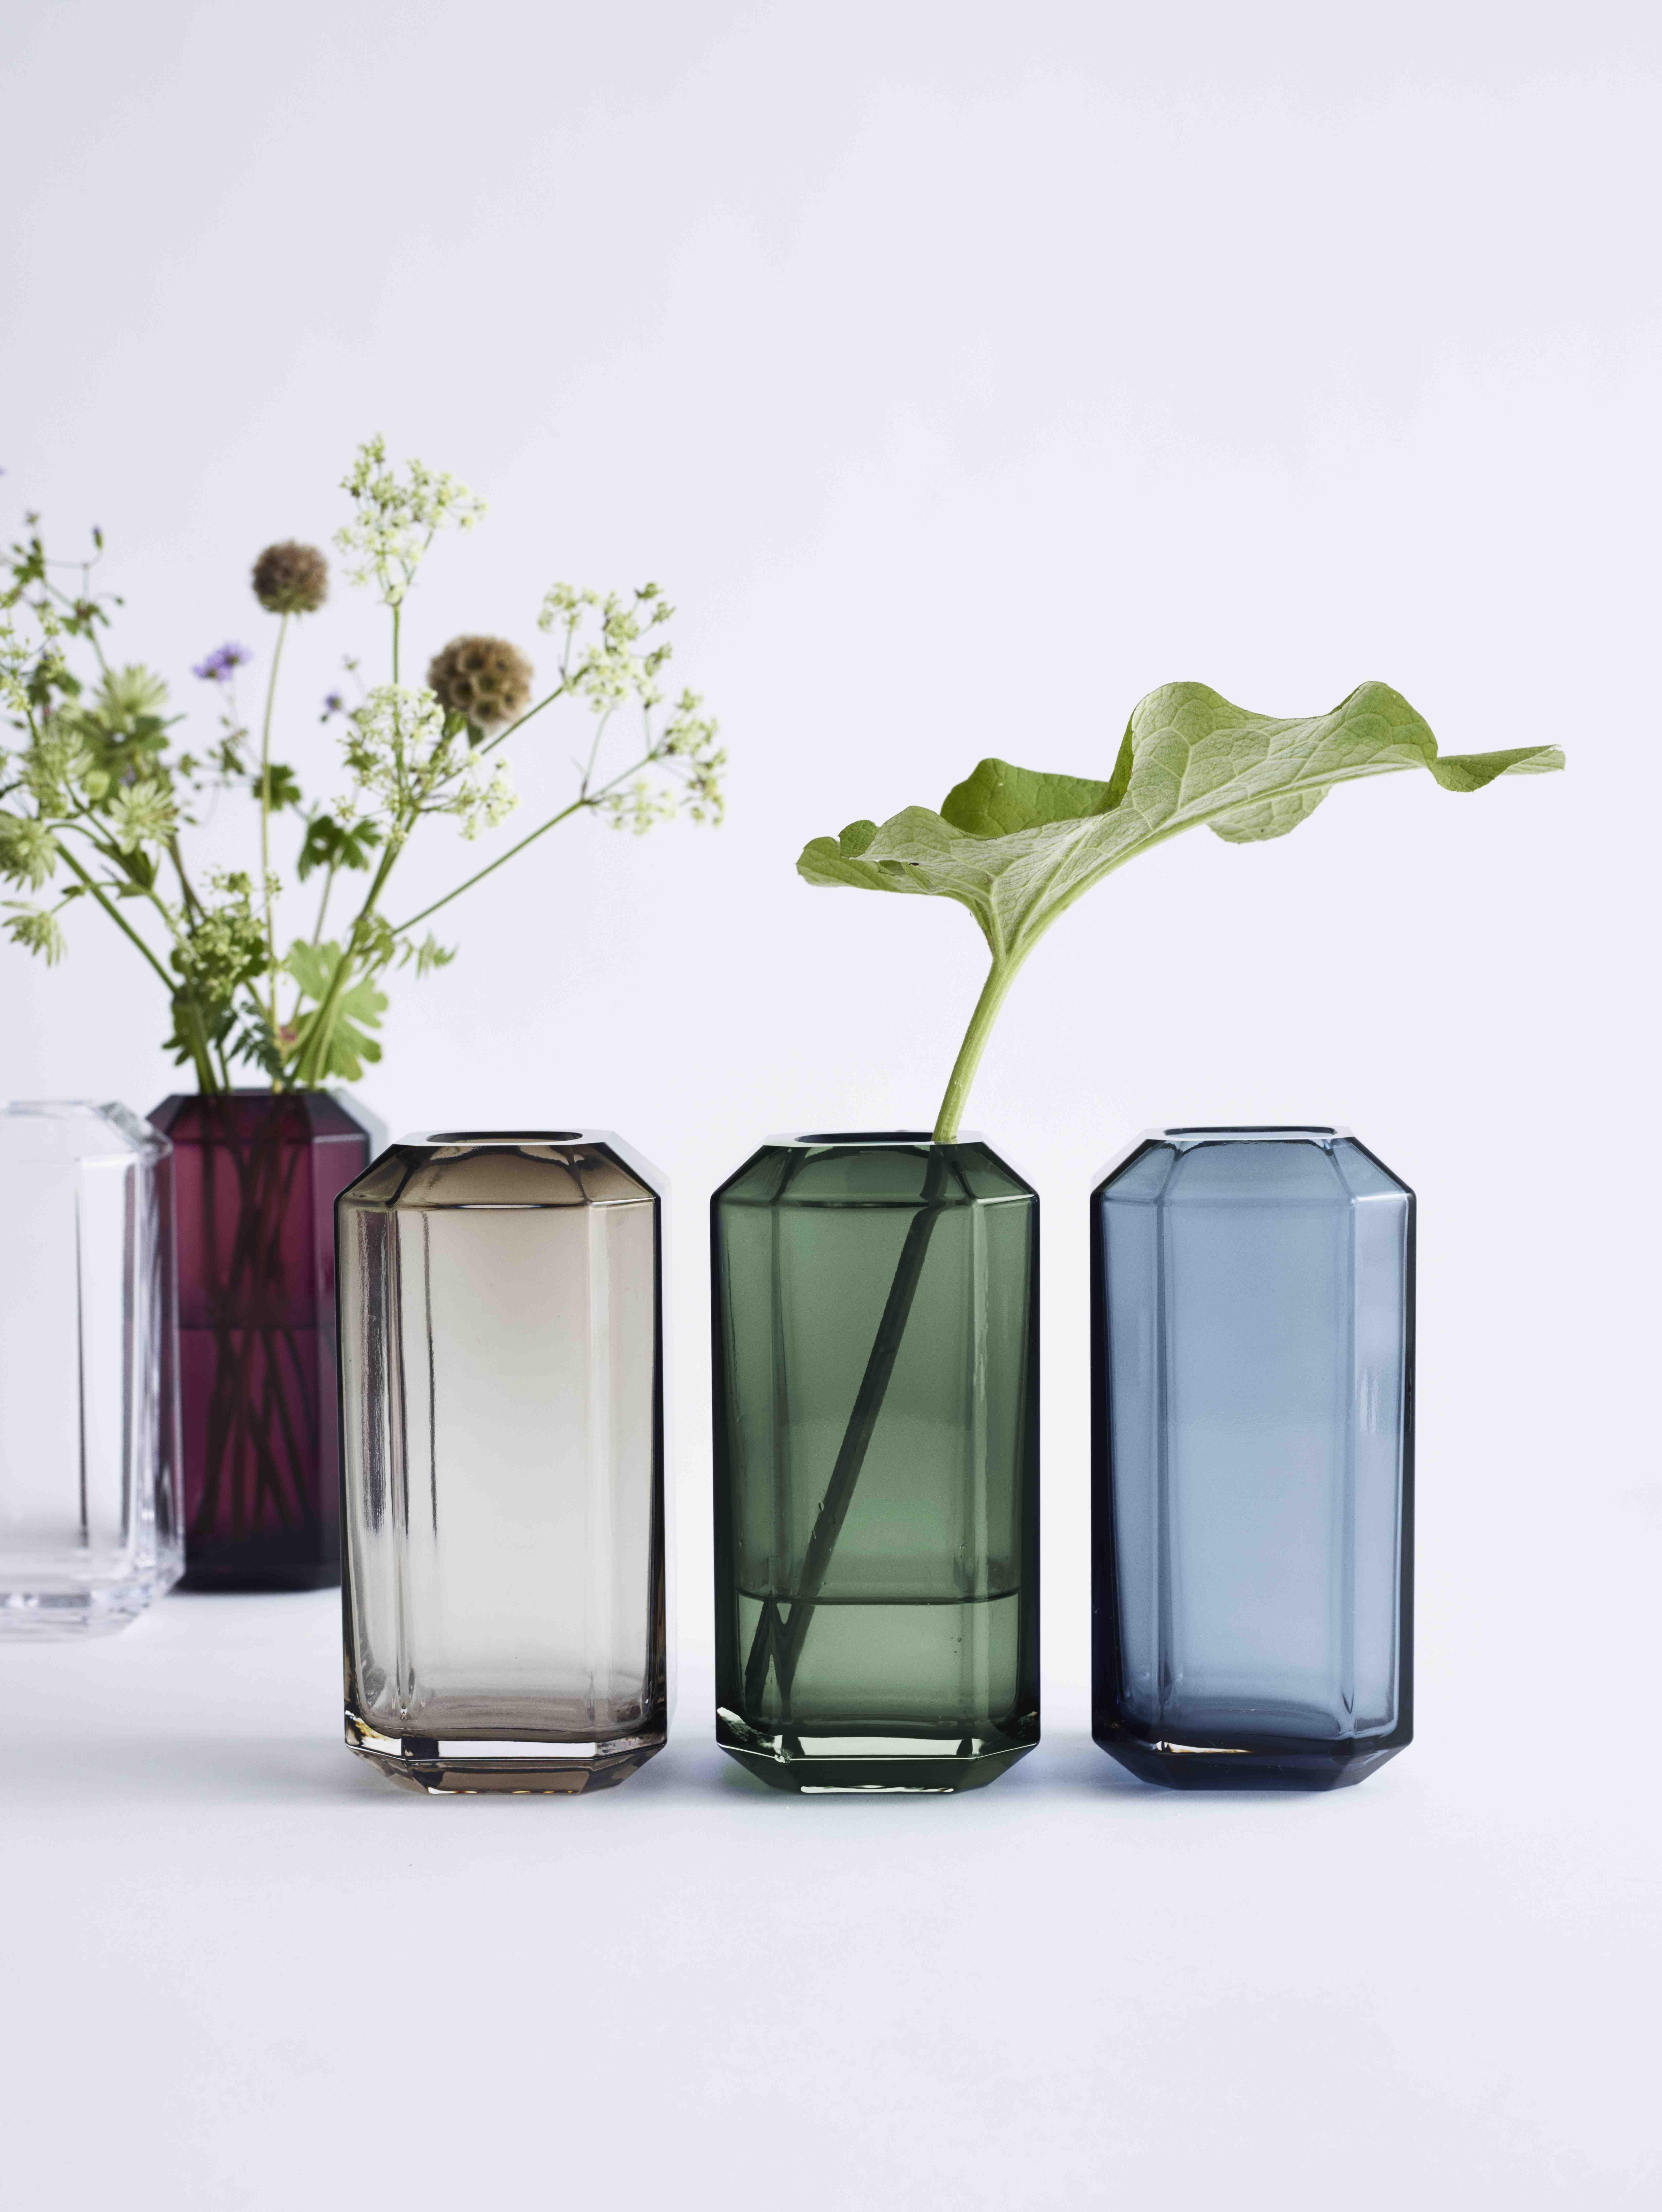 Louise Roe Copenhagen Aw16 The Jewel Vase House Or A Home Vases Decor Vase Scandinavian Vases